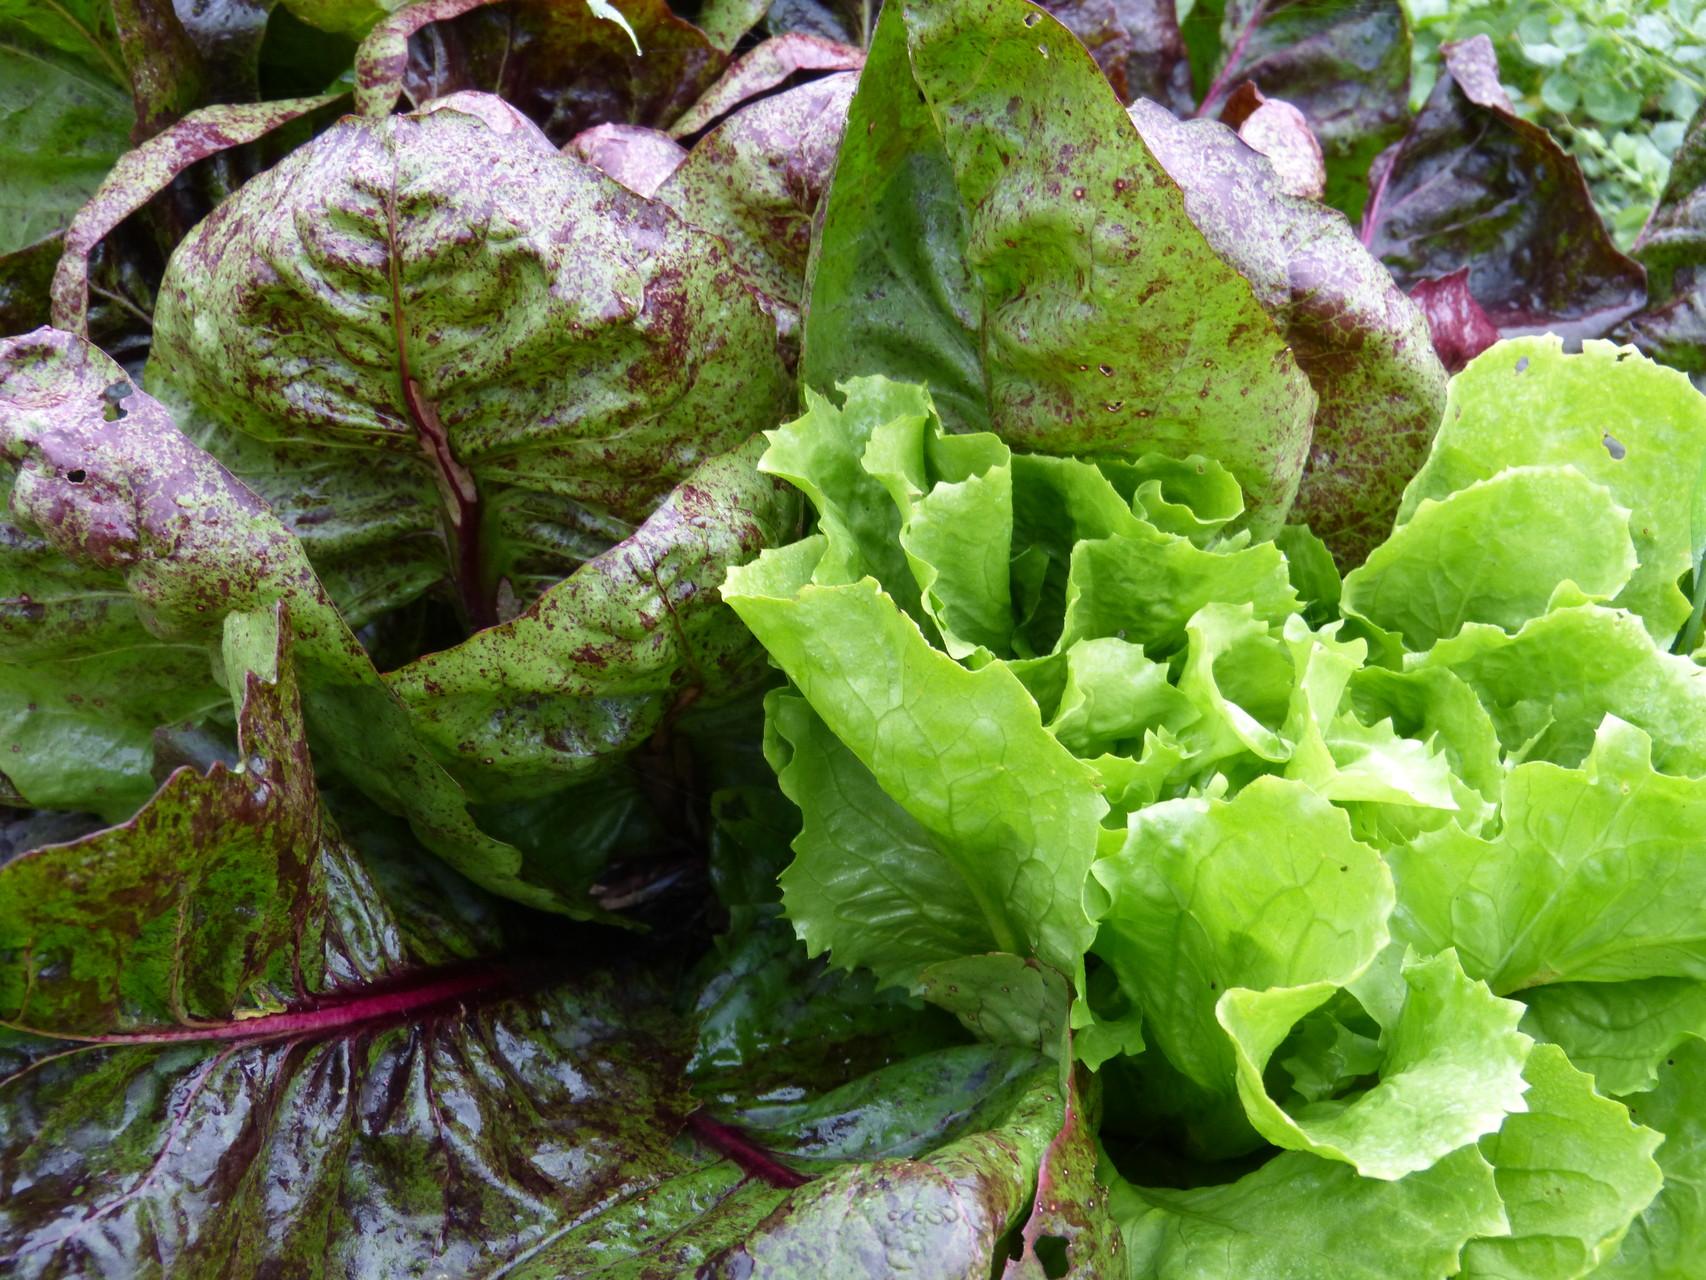 salade prête à être cueillies mai 2015